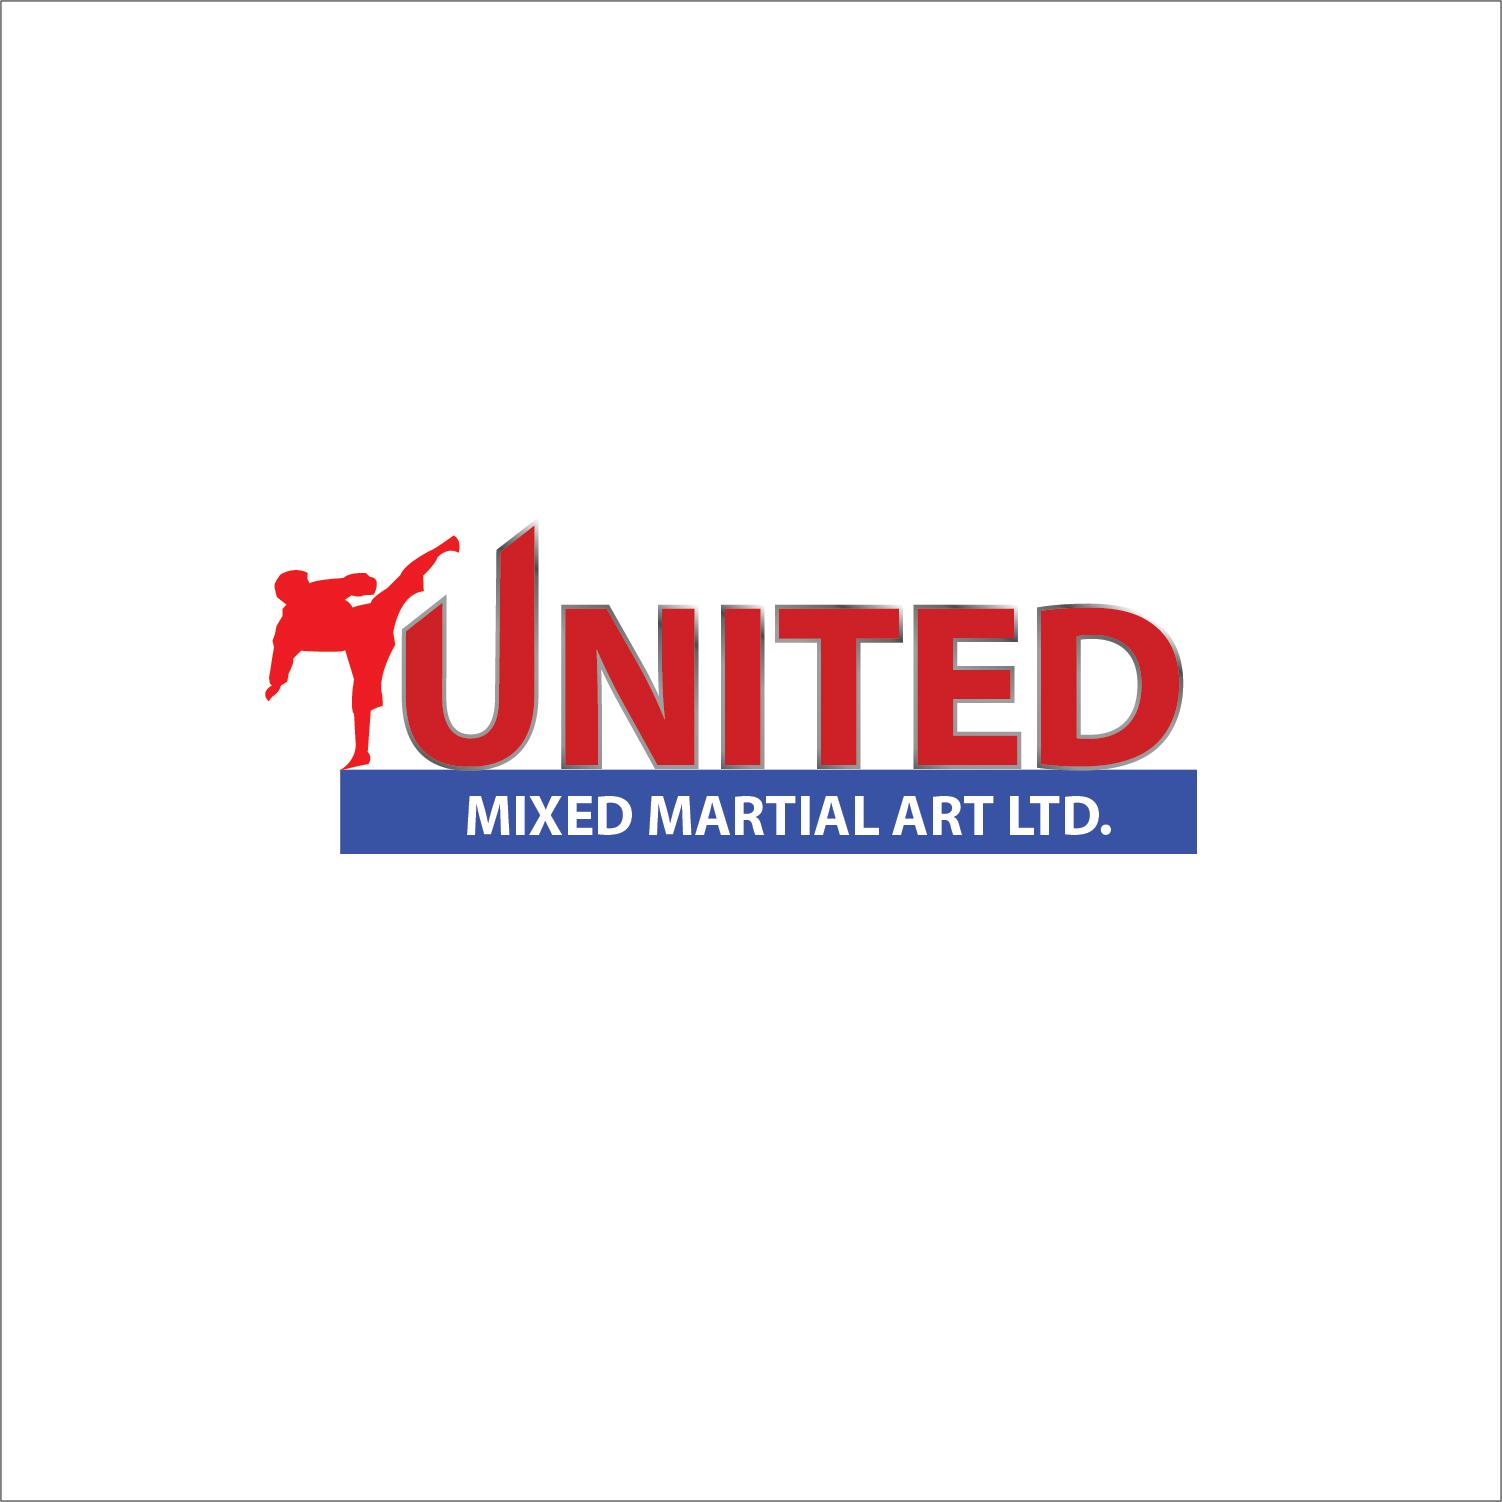 Logo Design by Shadman Sakib - Entry No. 92 in the Logo Design Contest Artistic Logo Design for United Mixed Martial Arts Ltd..